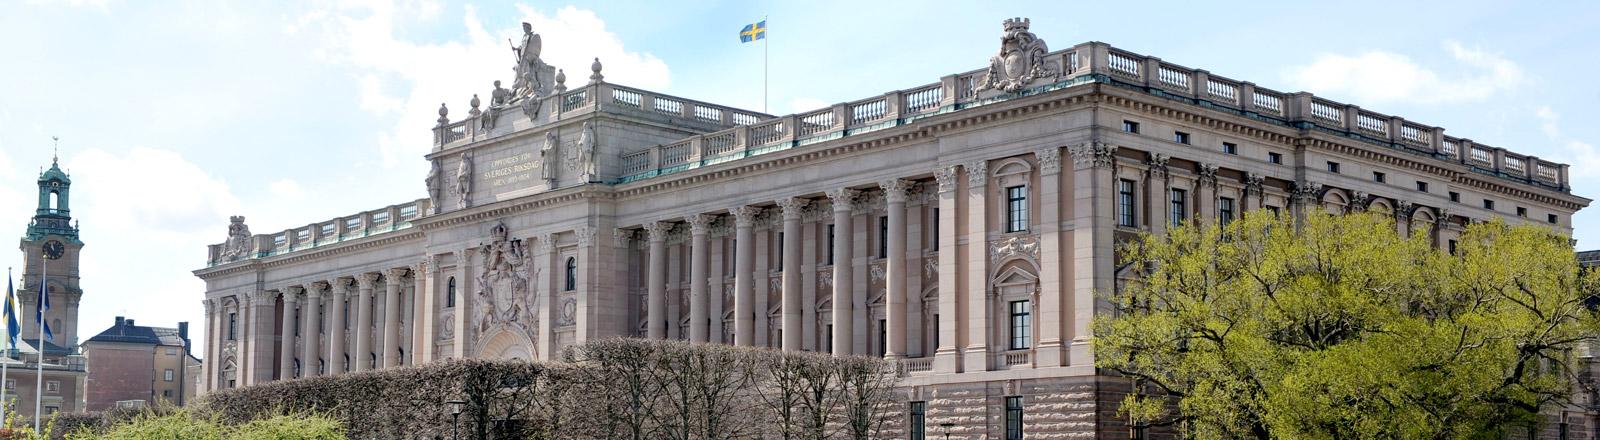 Parlamentsgebäude in Stockholm